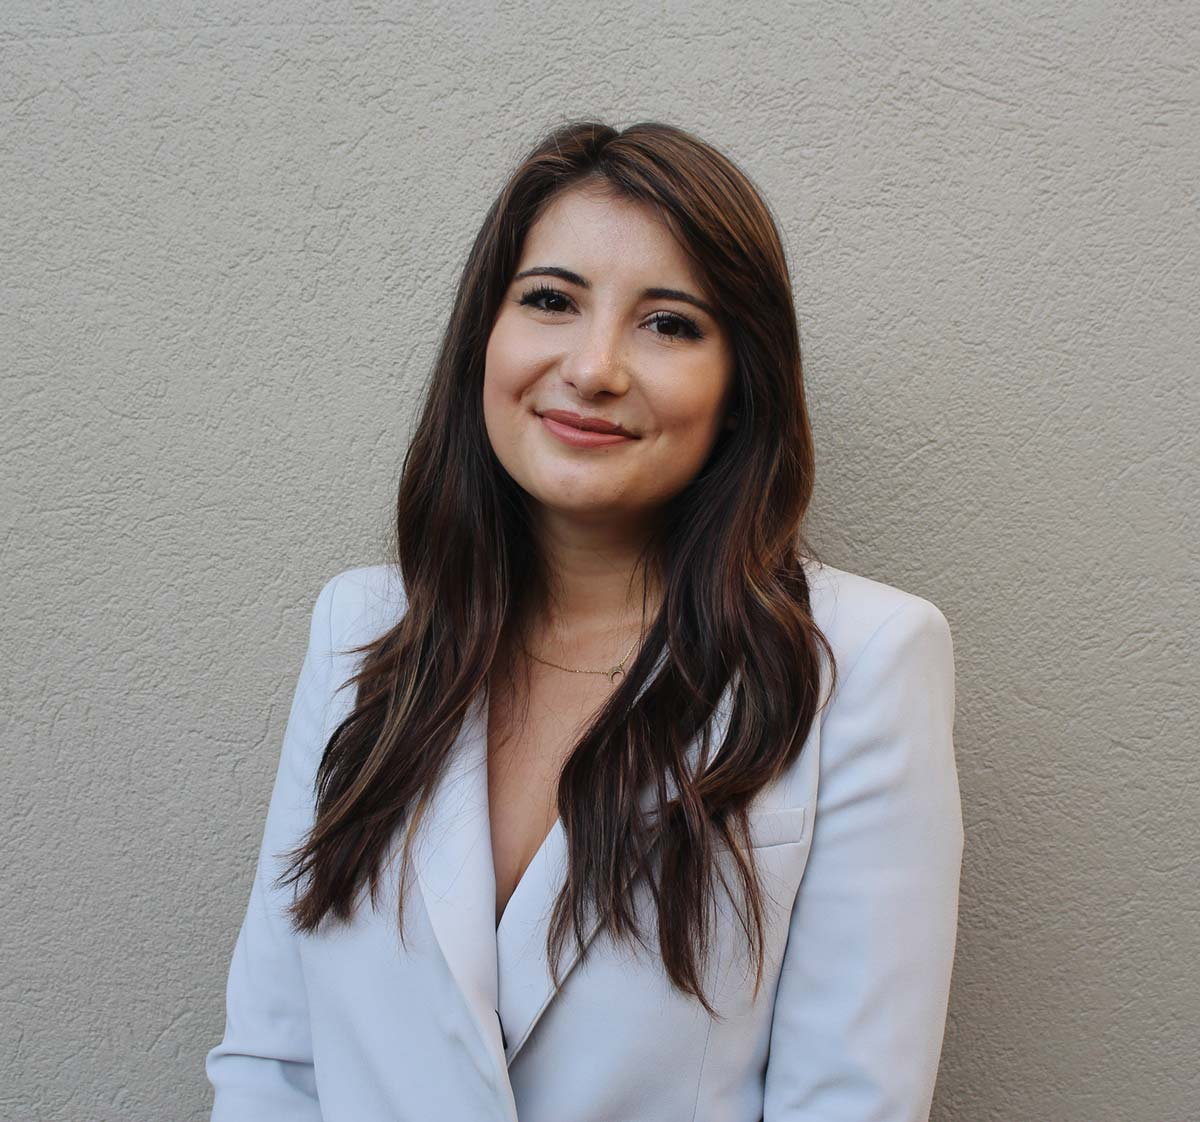 Mikaela DesLauriers